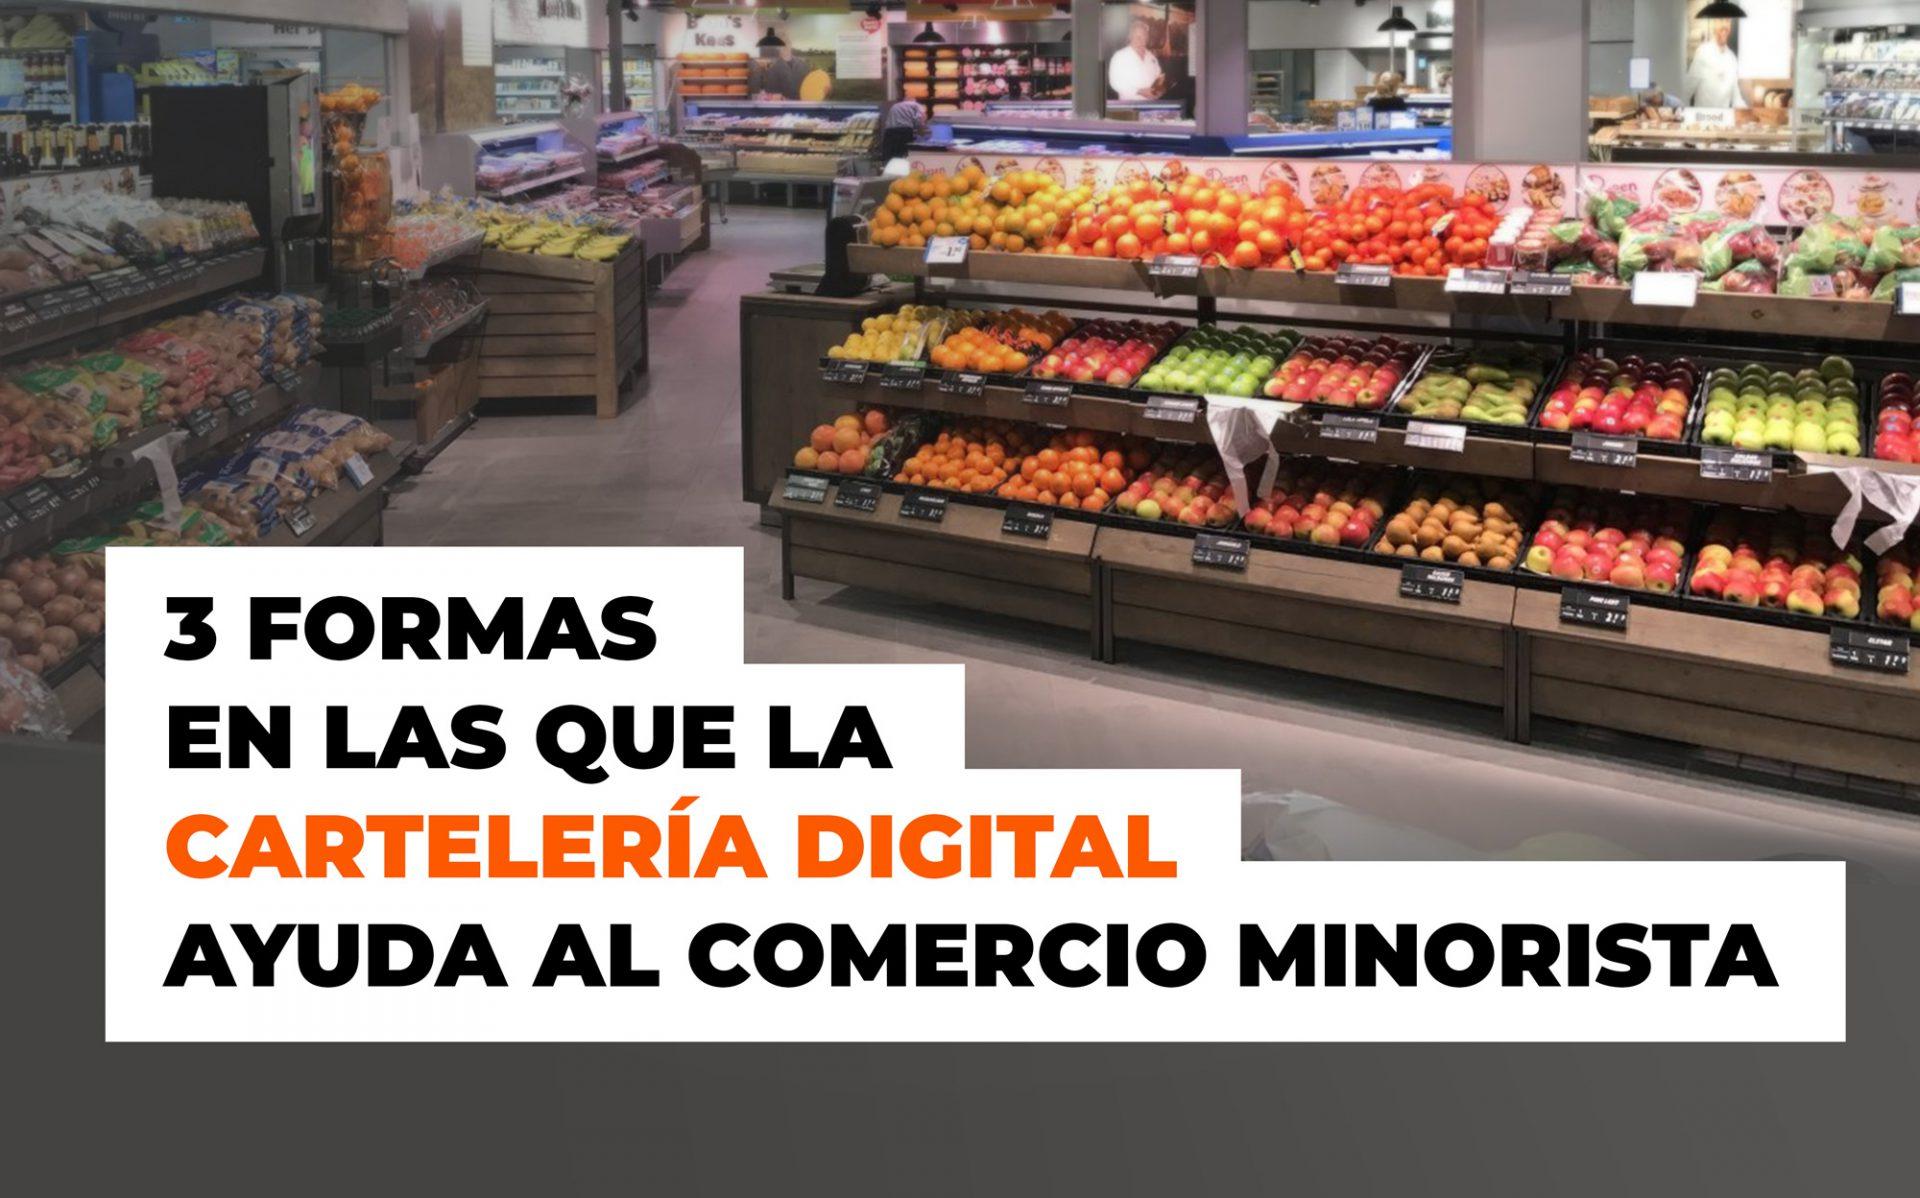 digital signage comercio minorista